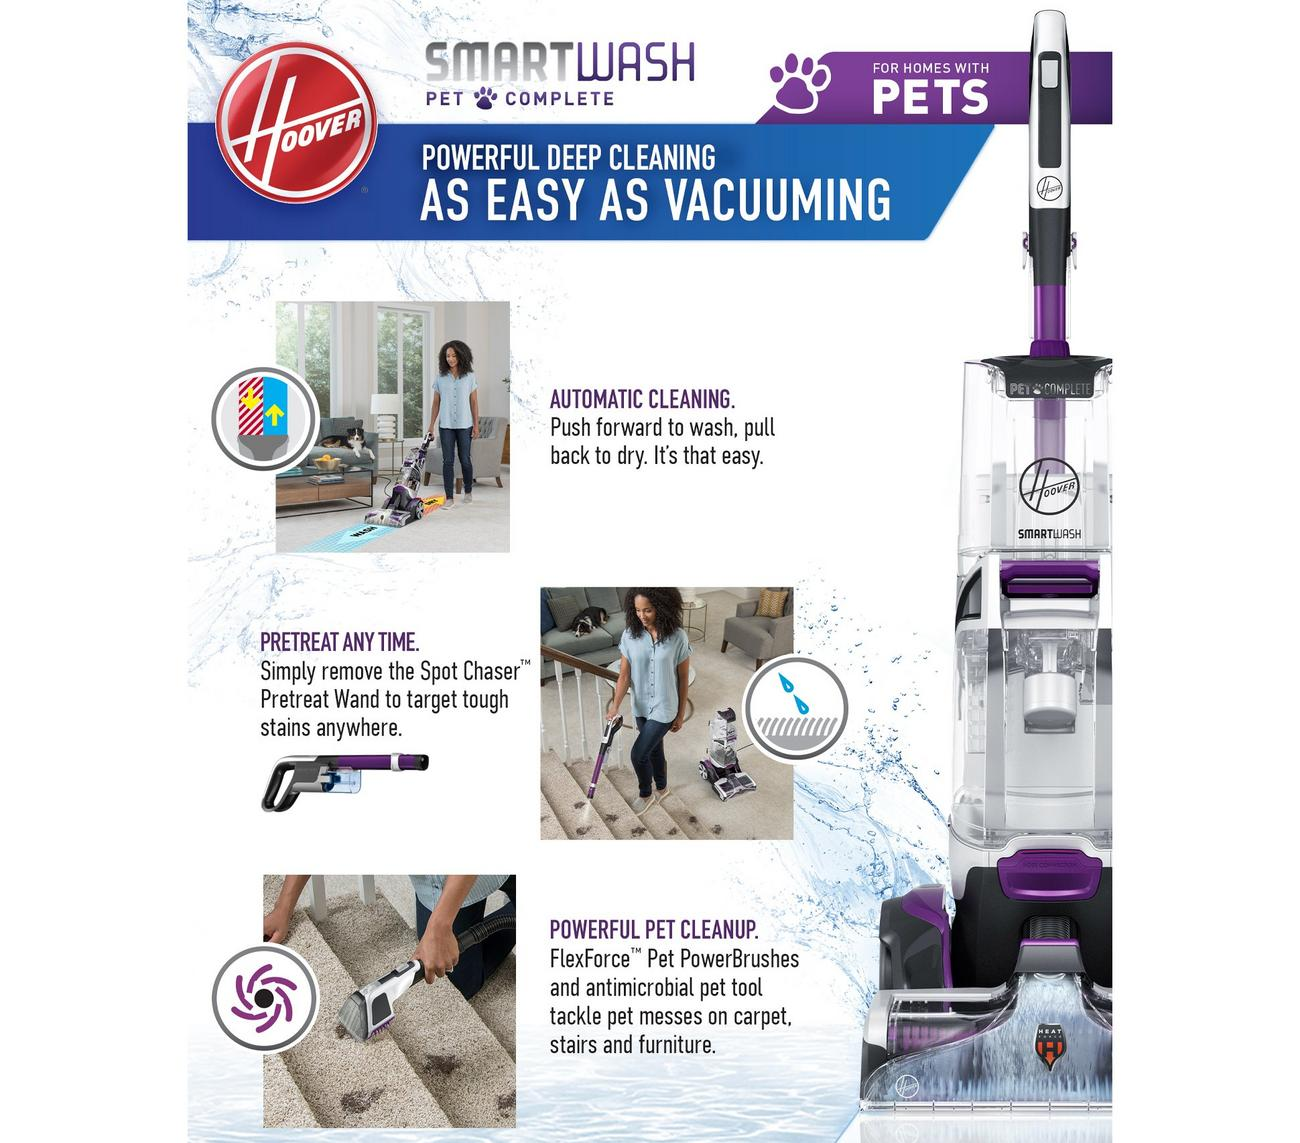 SmartWash PET